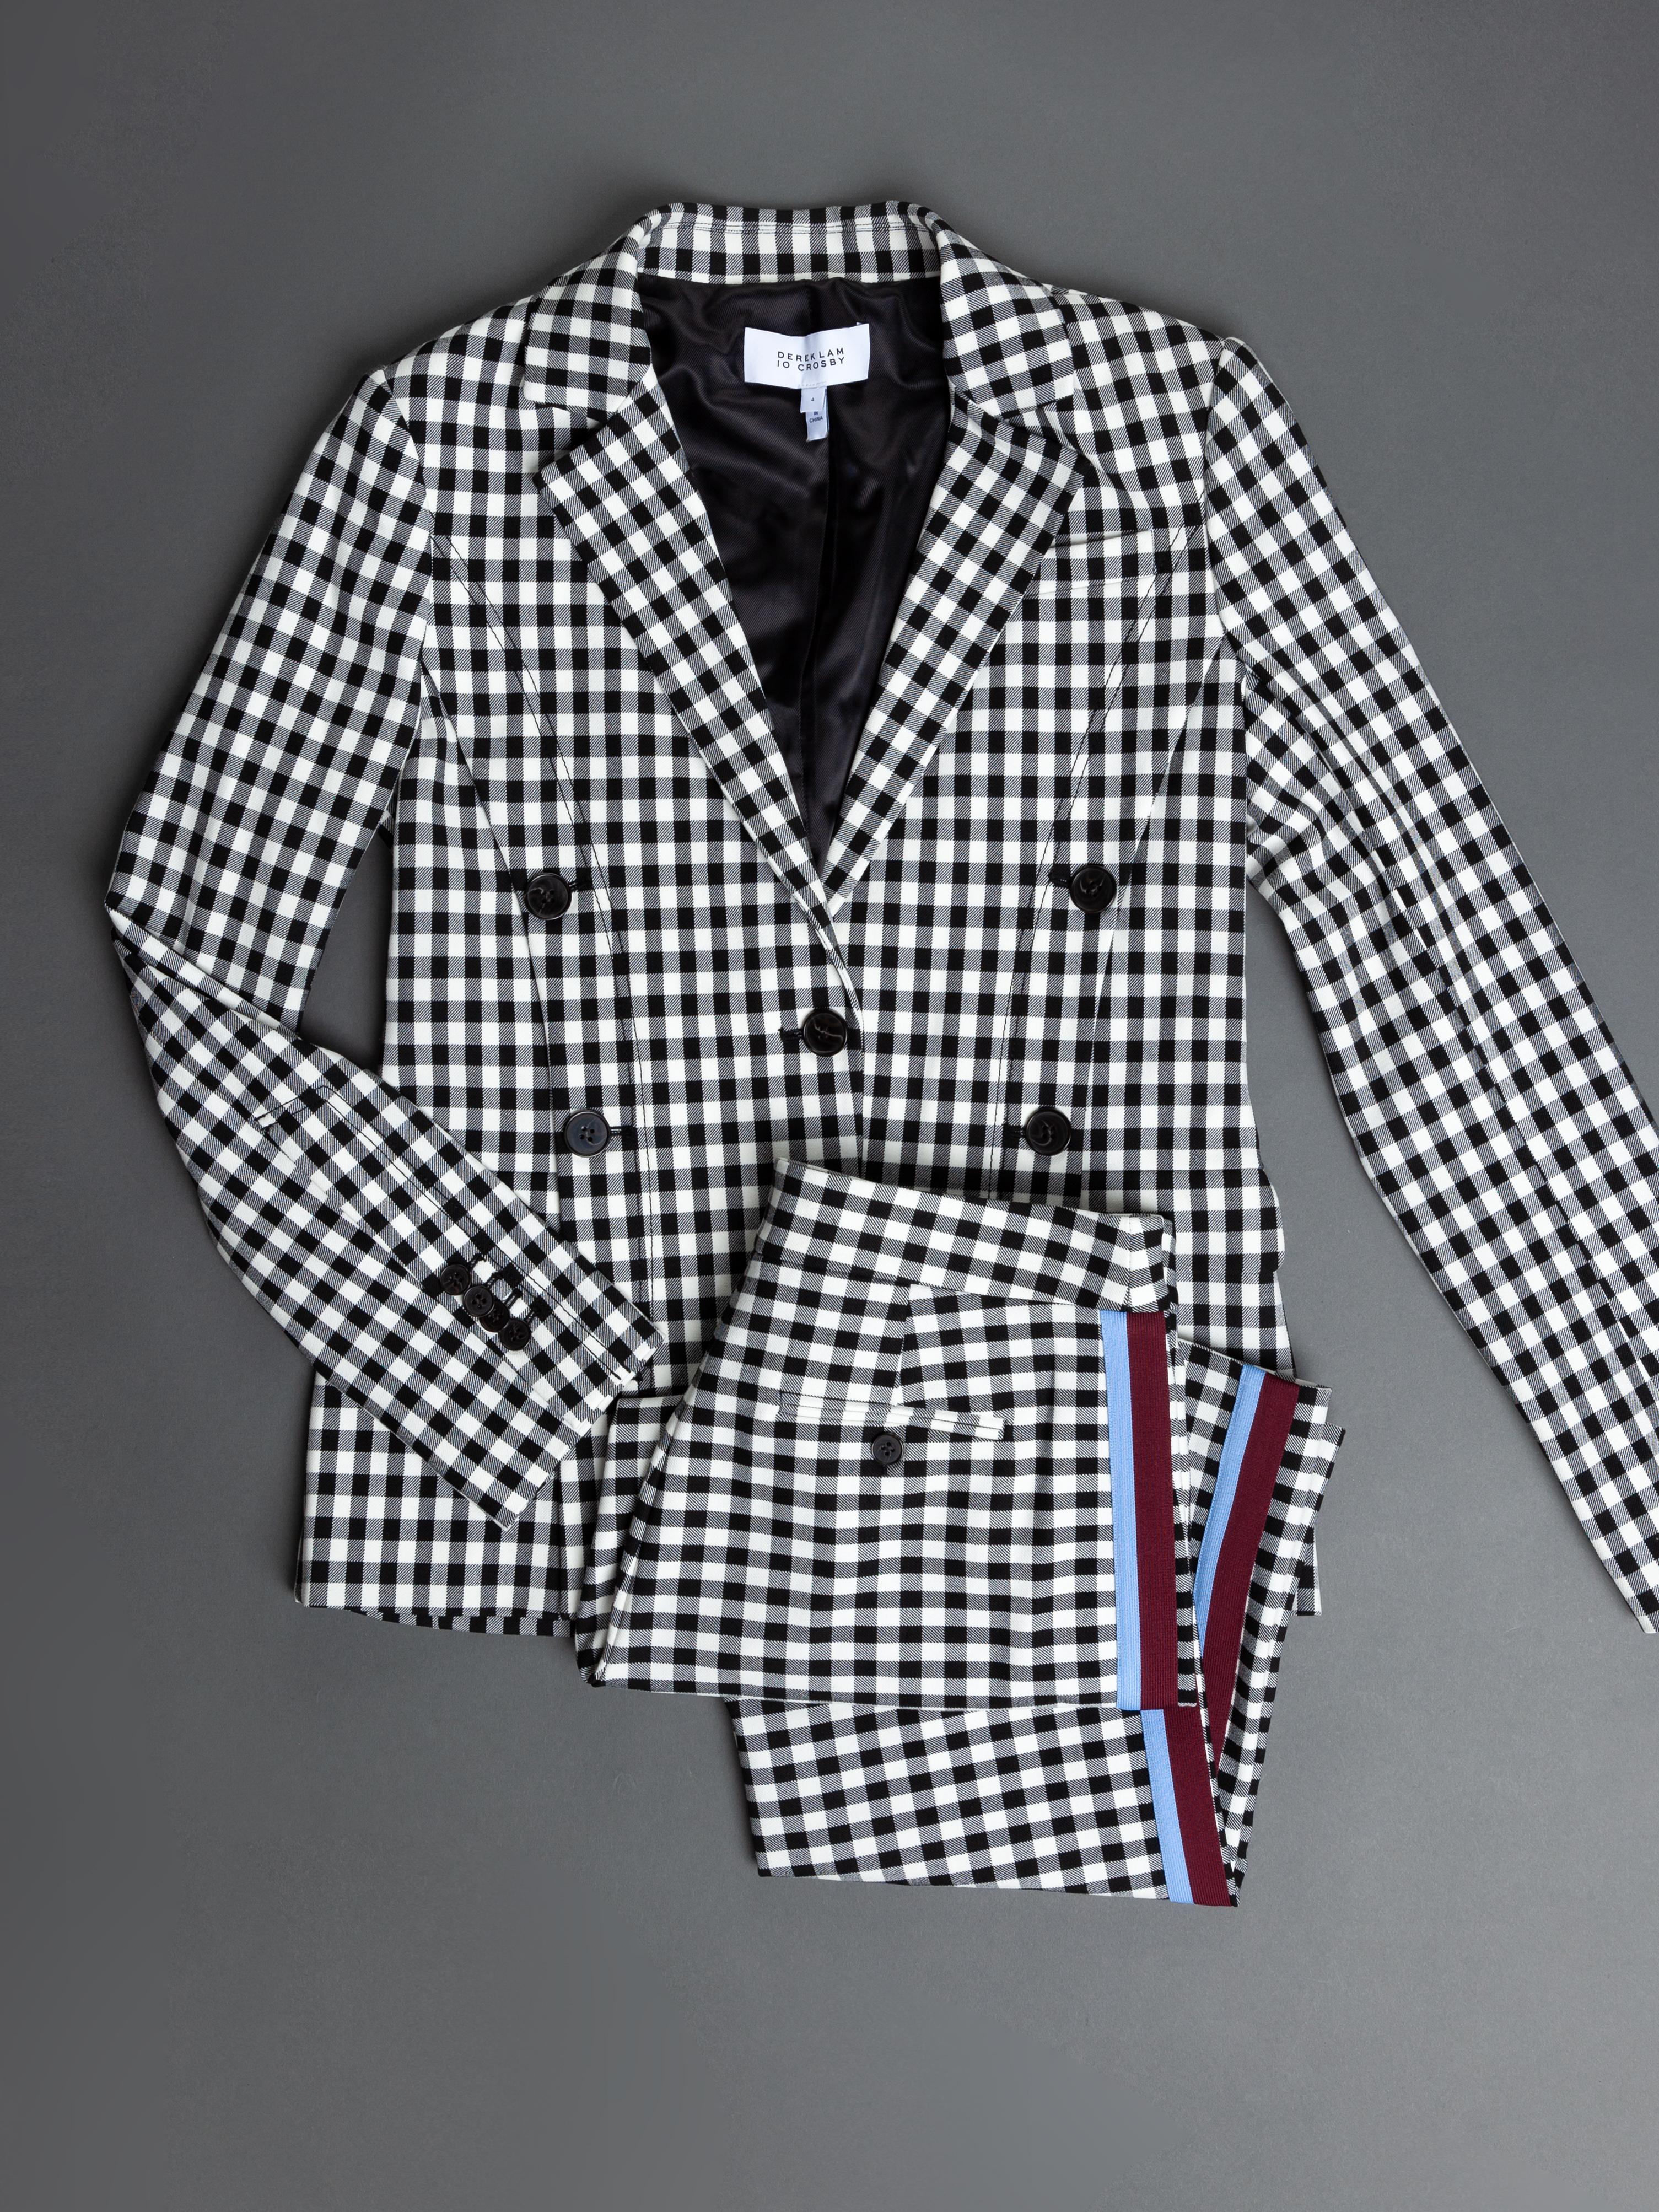 Suit: Derek Lam 10 Crosby, available at Hangar9